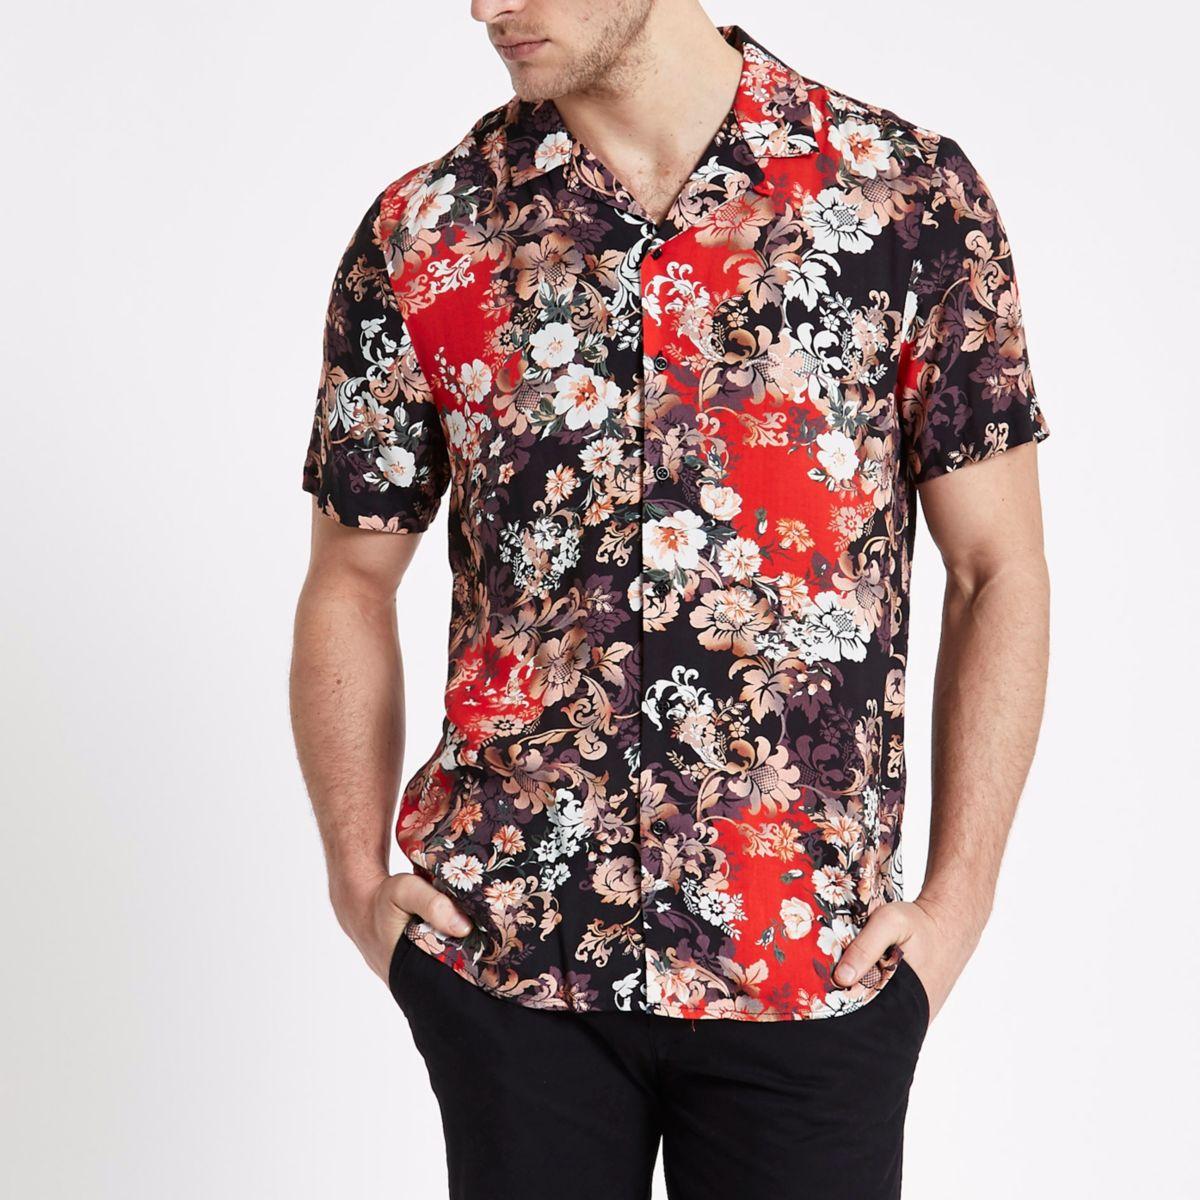 Zwart overhemd met reverskraagje, barokprint en korte mouwen